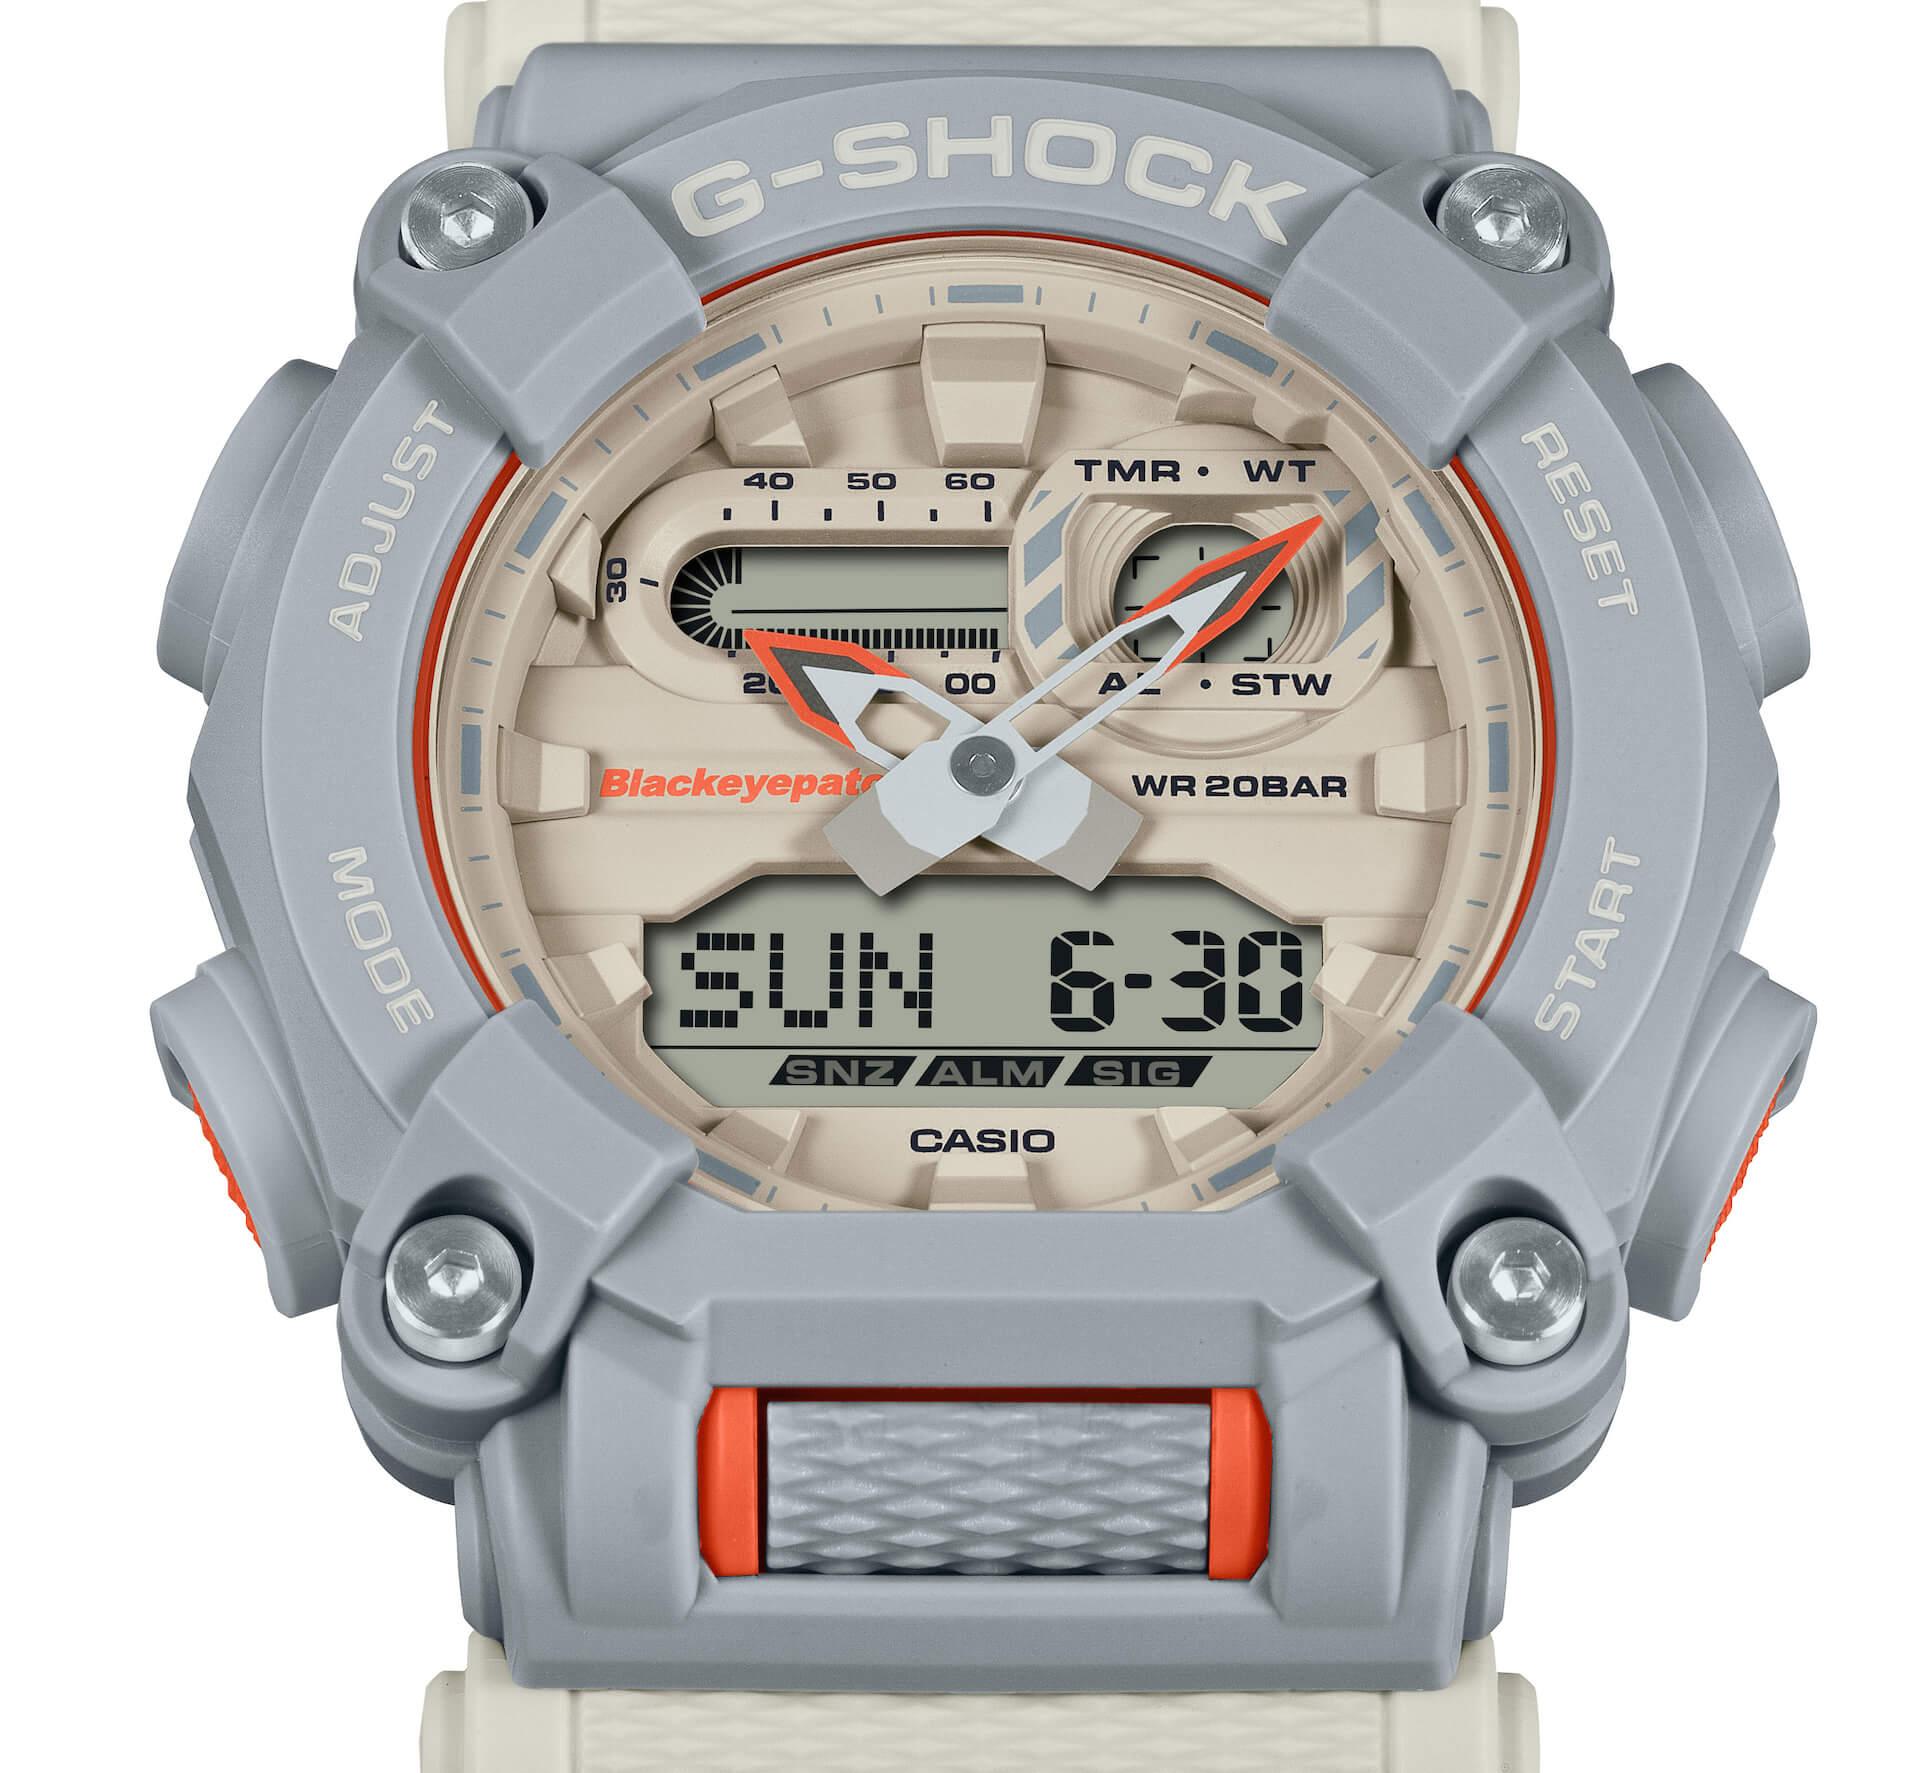 G-SHOCKとBlackEyePatchの新たなコラボモデル「GA-900BEP-8AJR」が発売決定!バンド交換可能なスタイリッシュなモデル tech210830_gshock_blackeyepatch_4